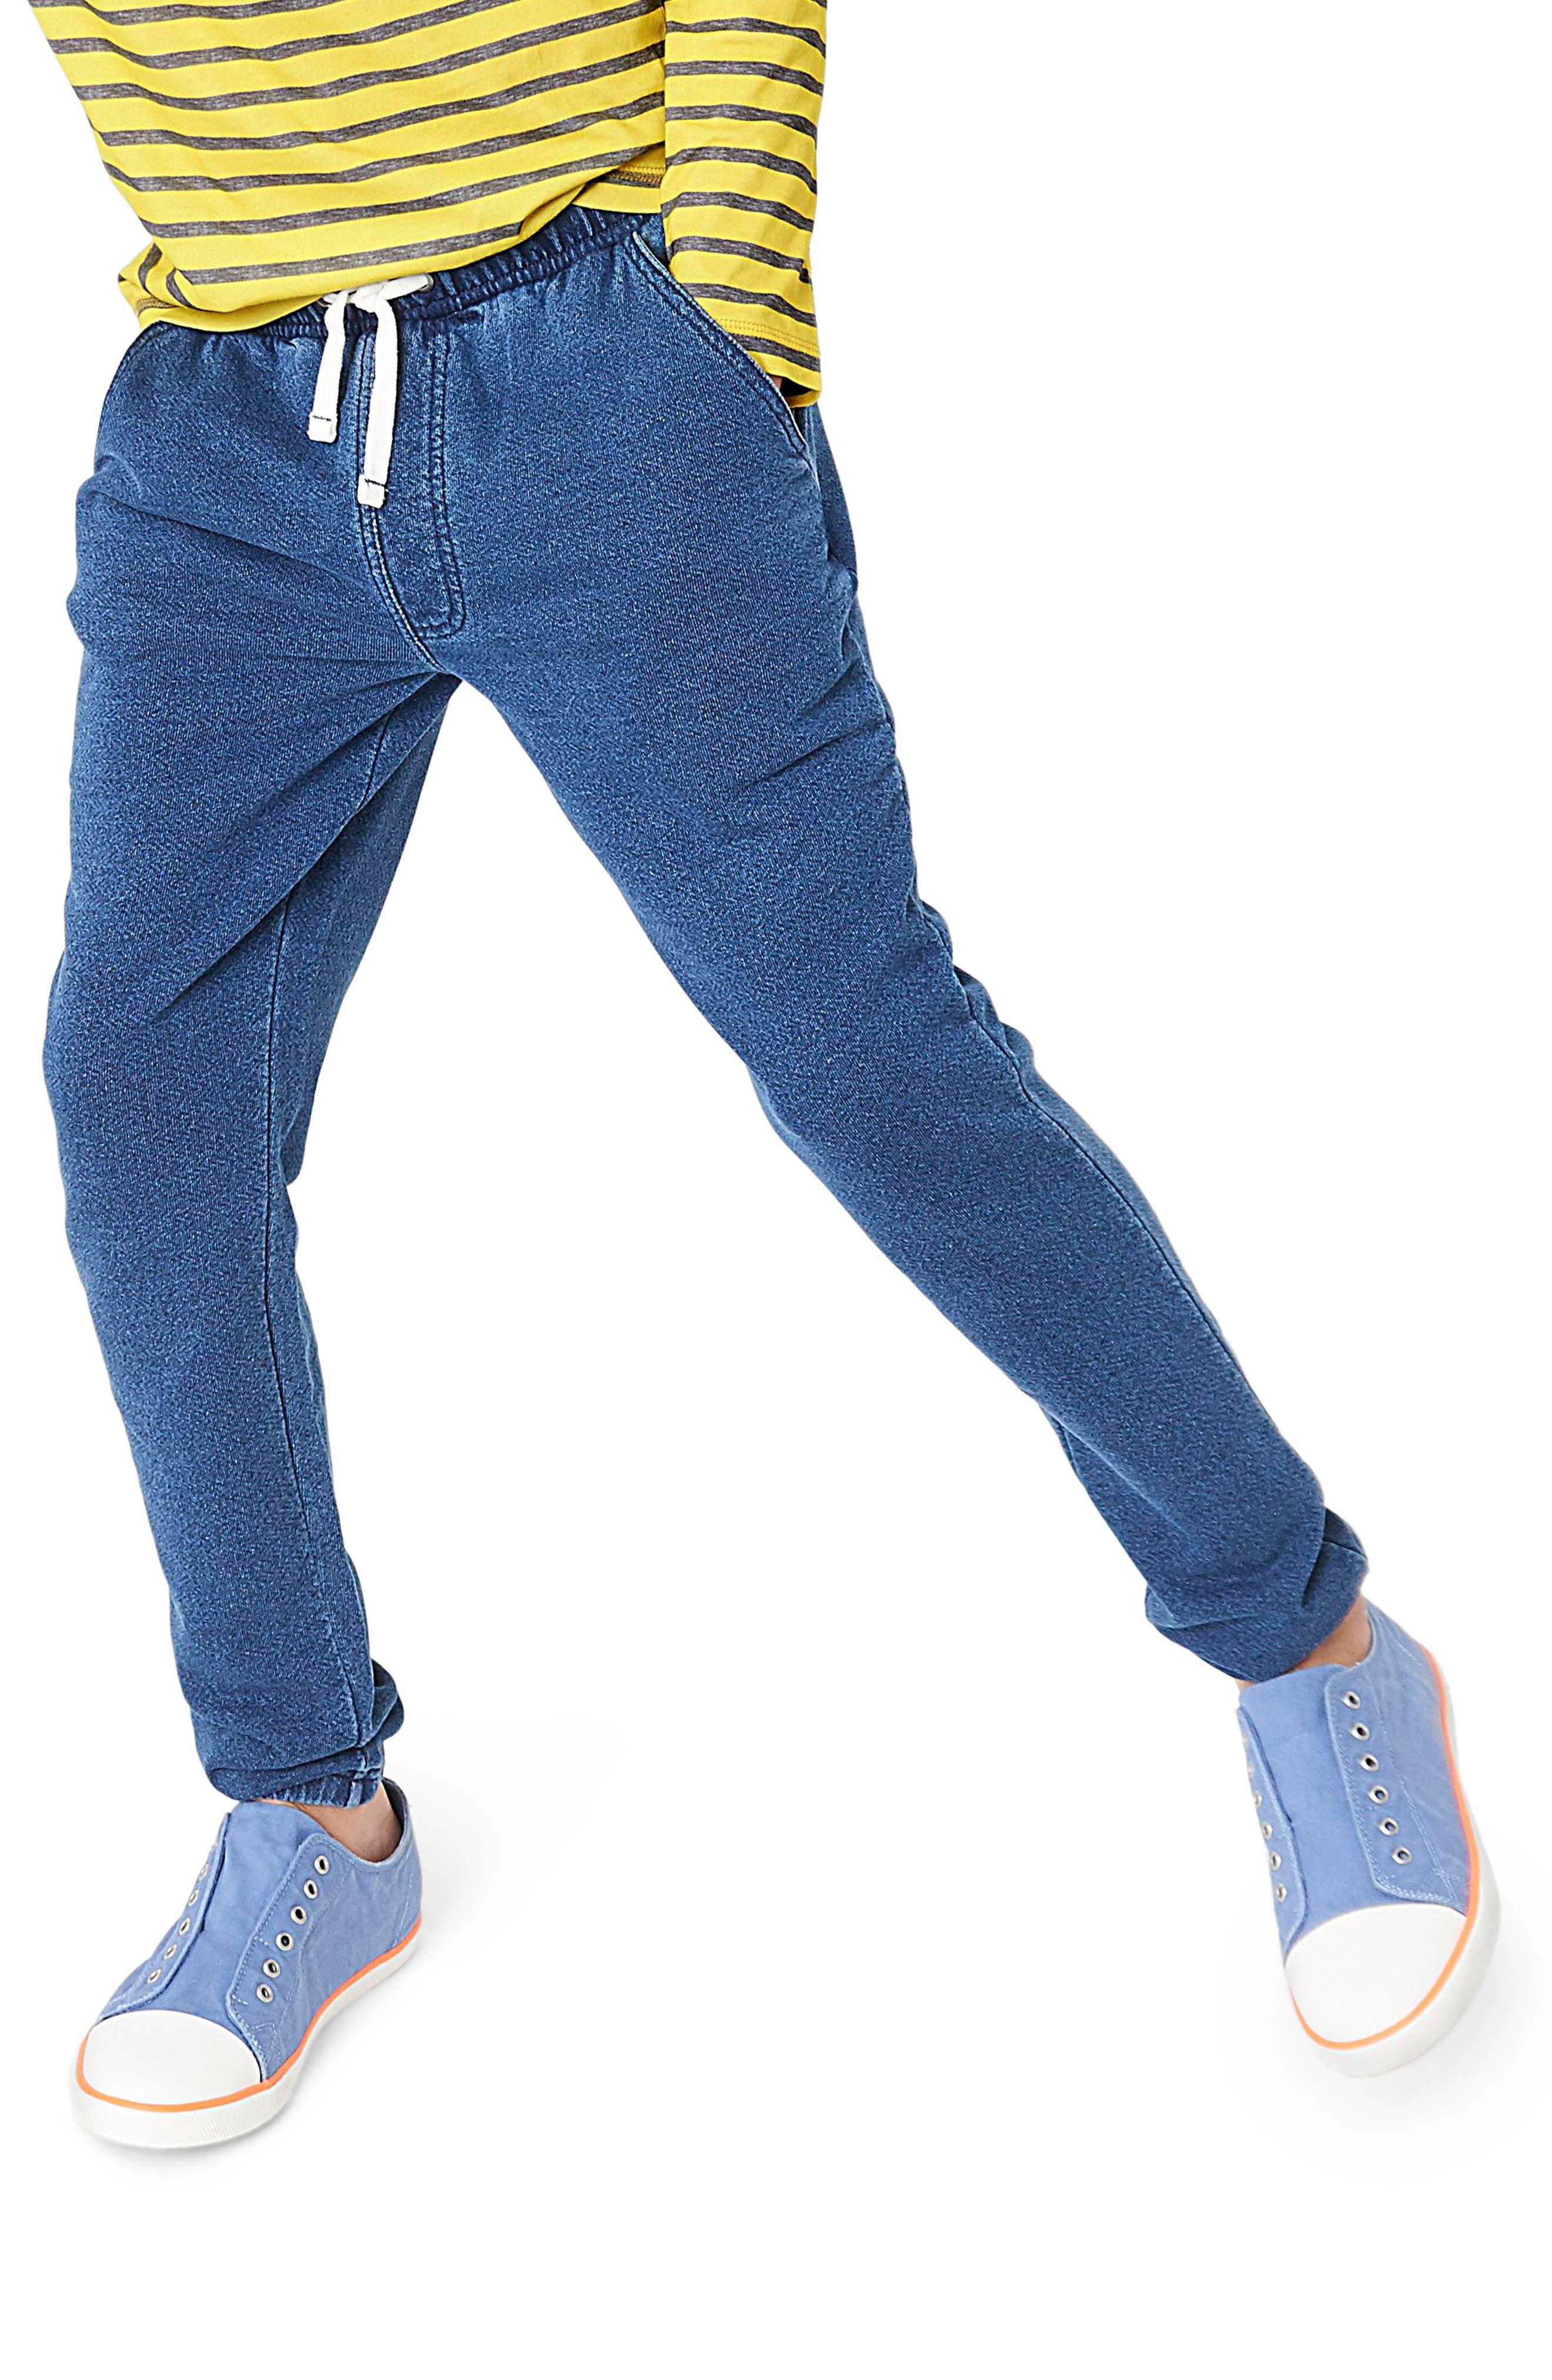 Jogger Pants,                             Alternate thumbnail 5, color,                             Indigo Blue